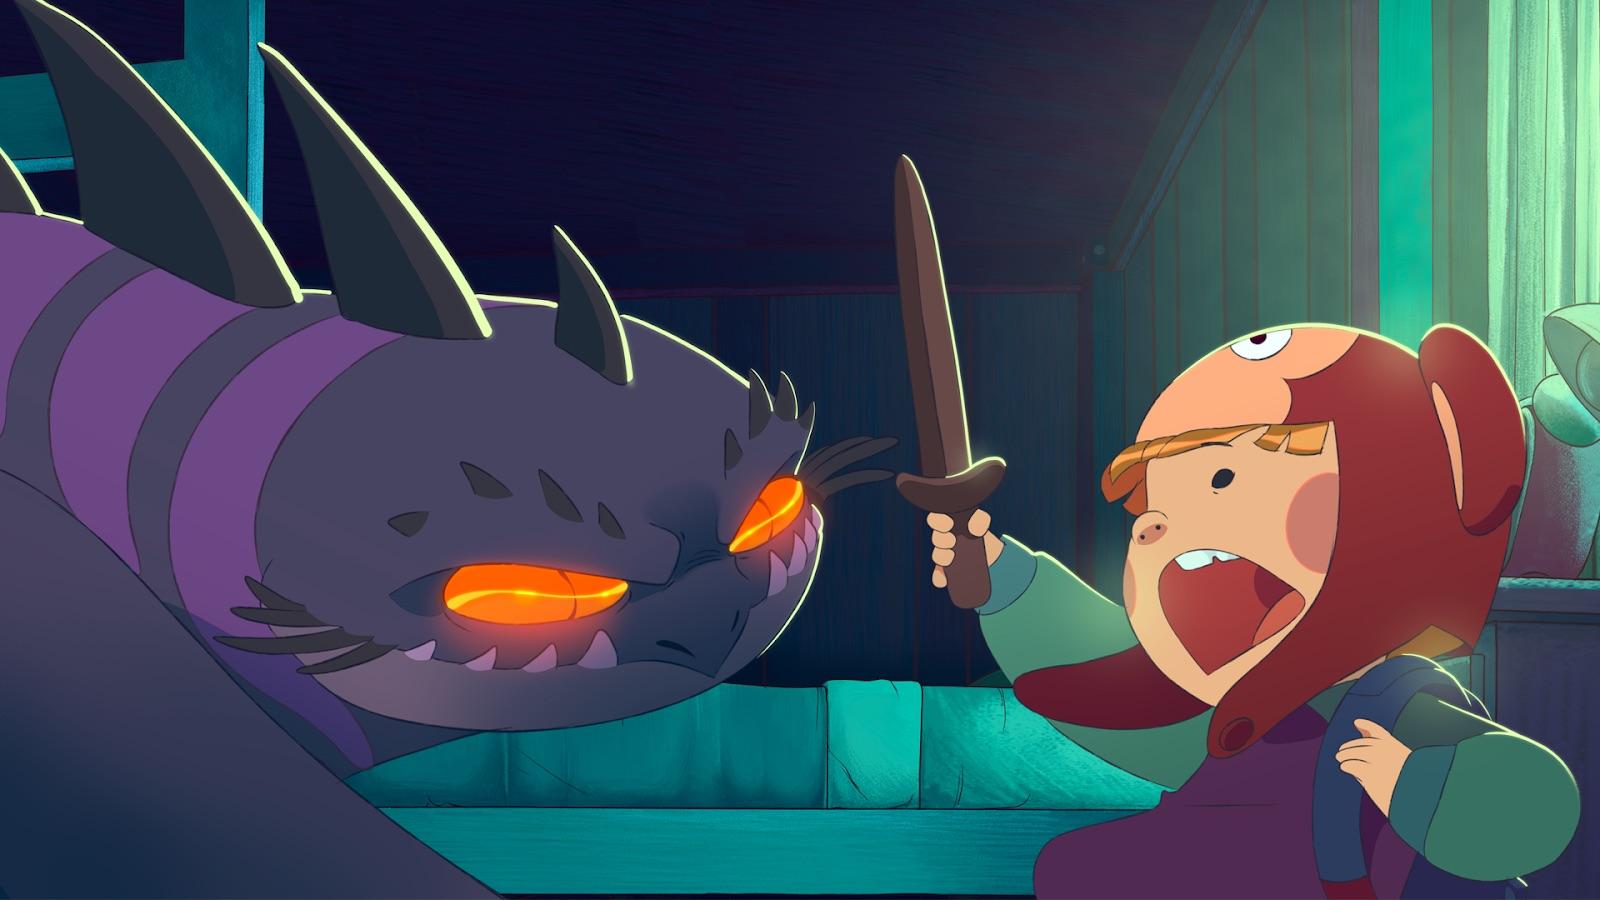 Director Eduardo Rivero On Fighting Stigma Around Cognitive Disabilities With New Animated Film